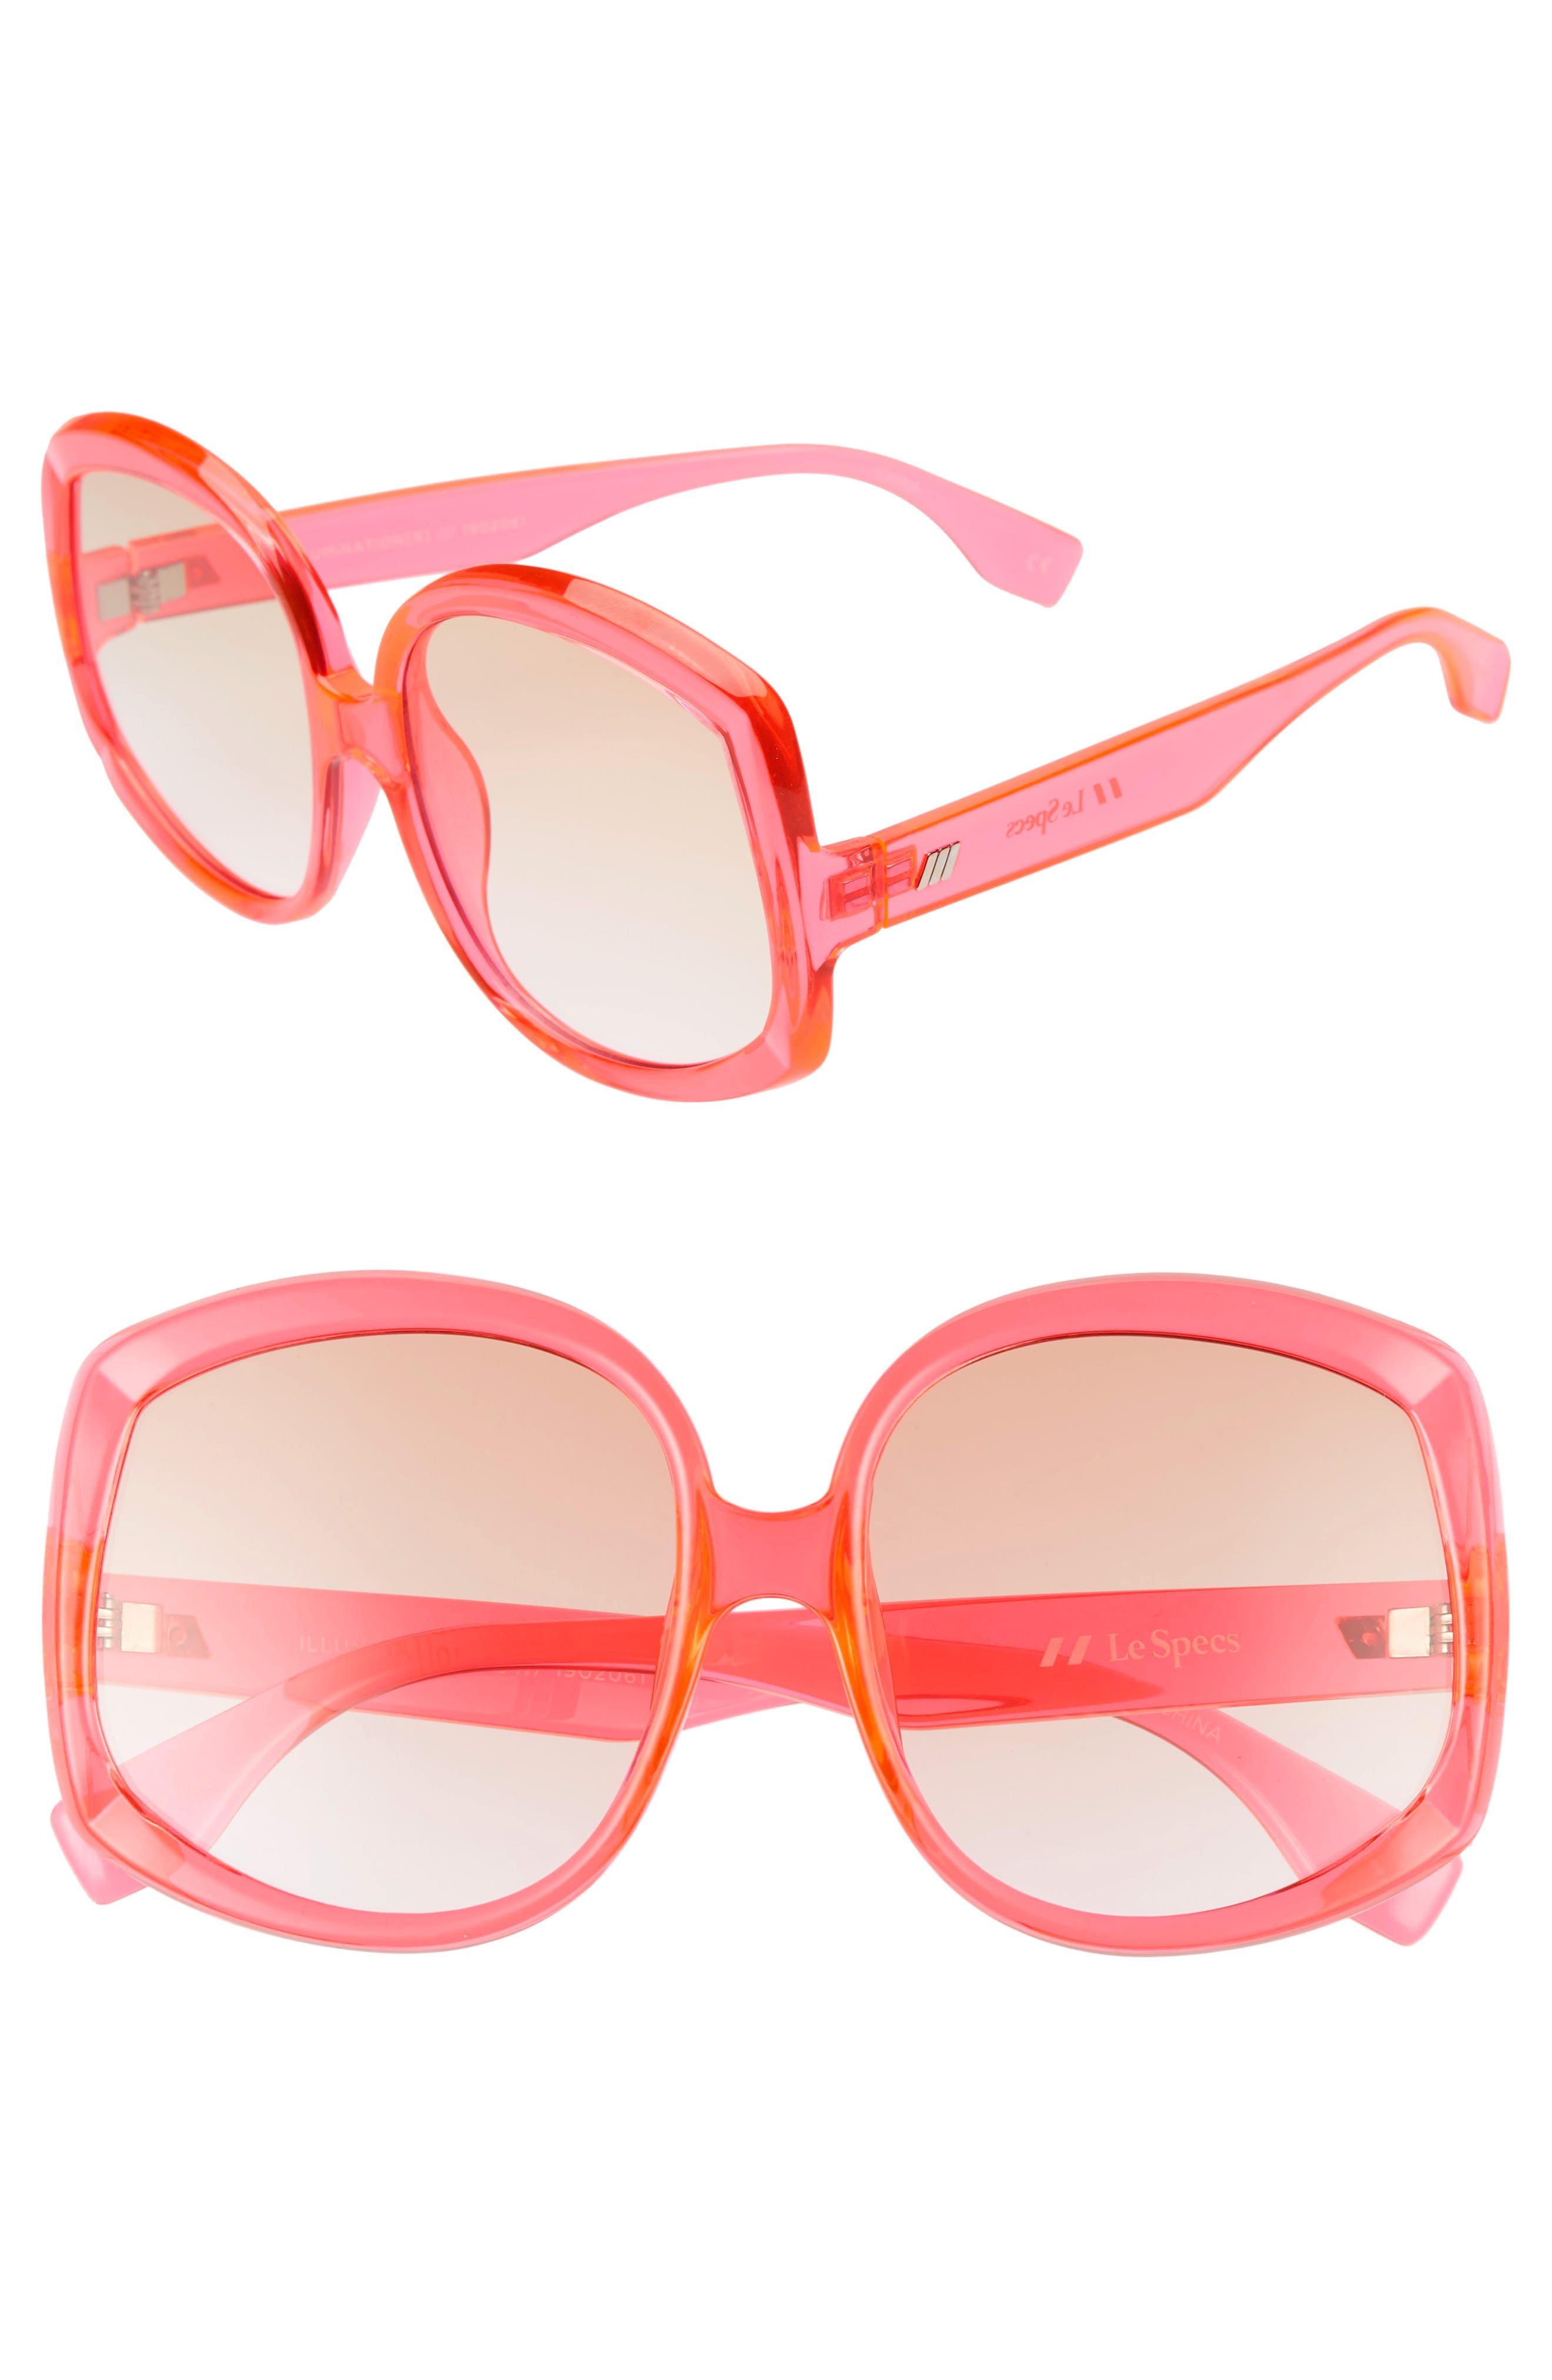 Le Specs Illumination 5m Square Sunglasses - Hot Pink/ Tan Gradient